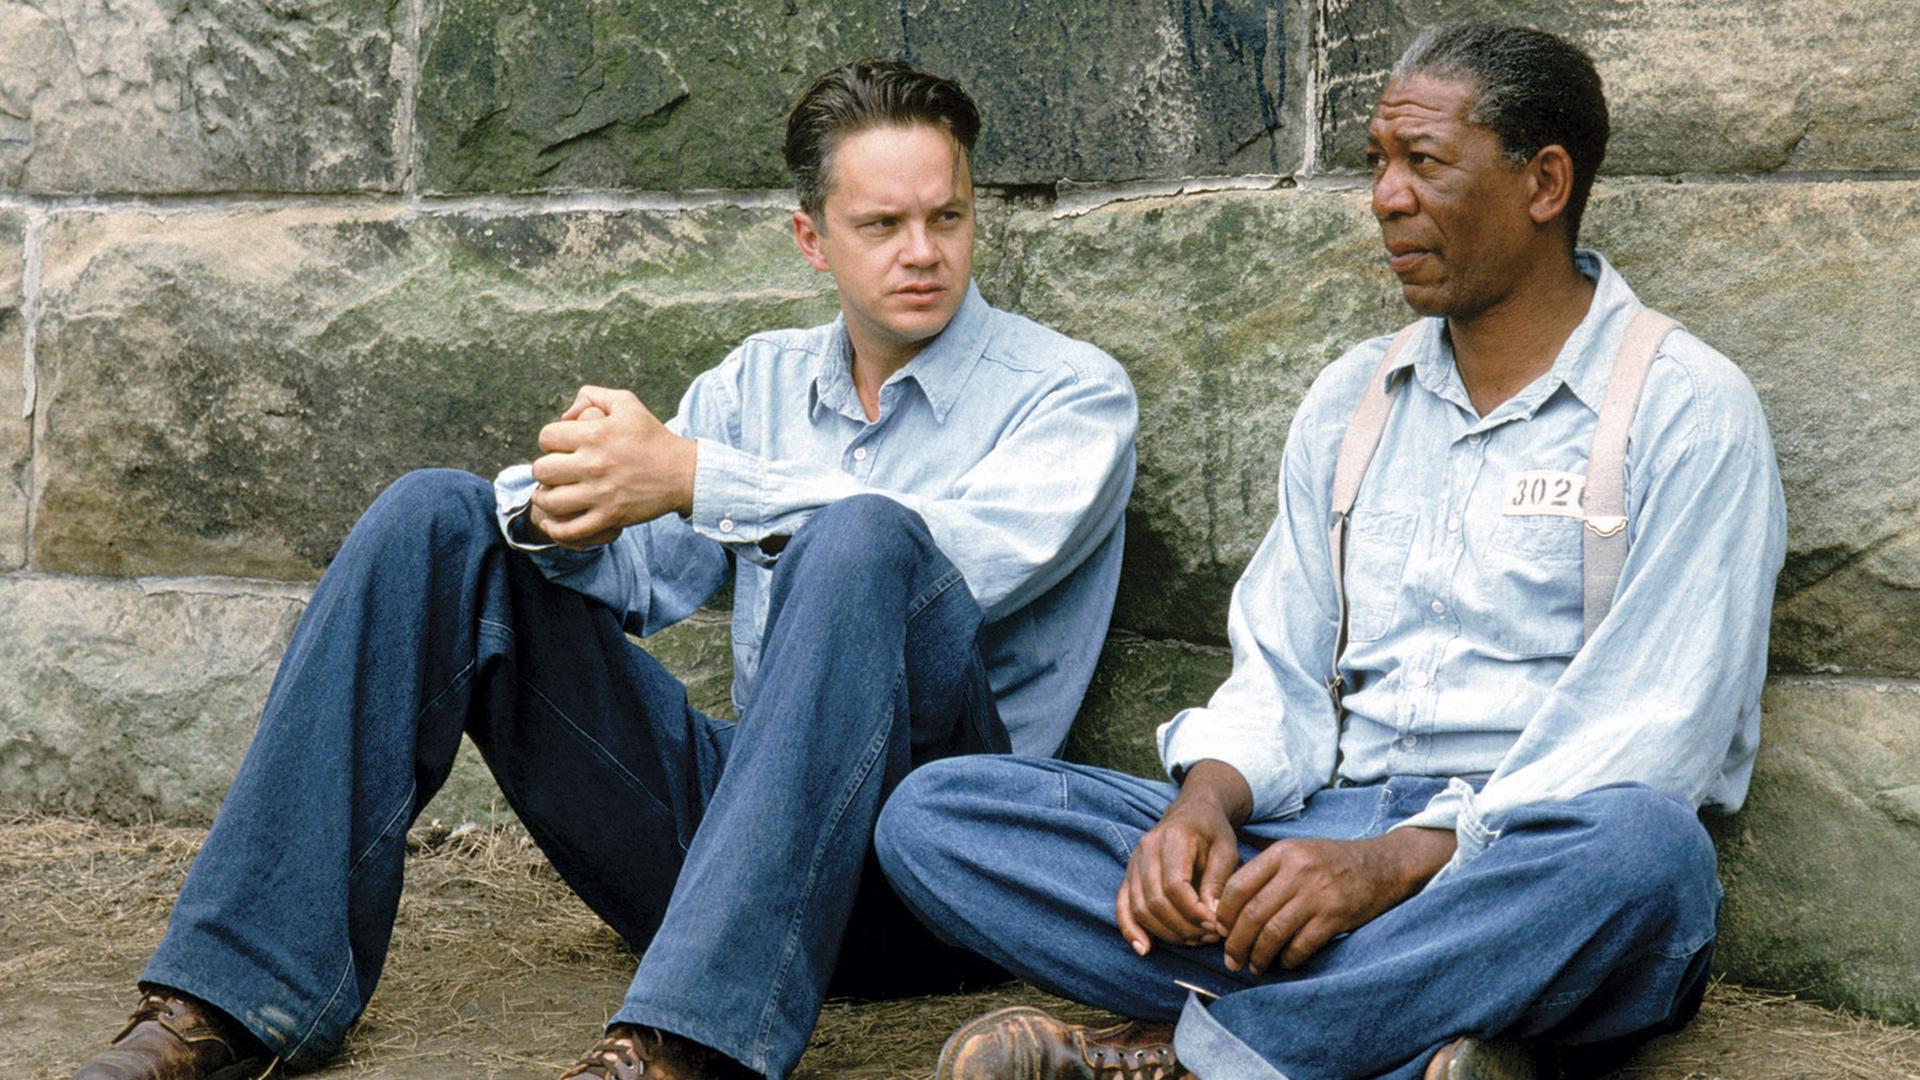 The Shawshank Redemption 20th anniversary Tim Robbins Morgan Freeman